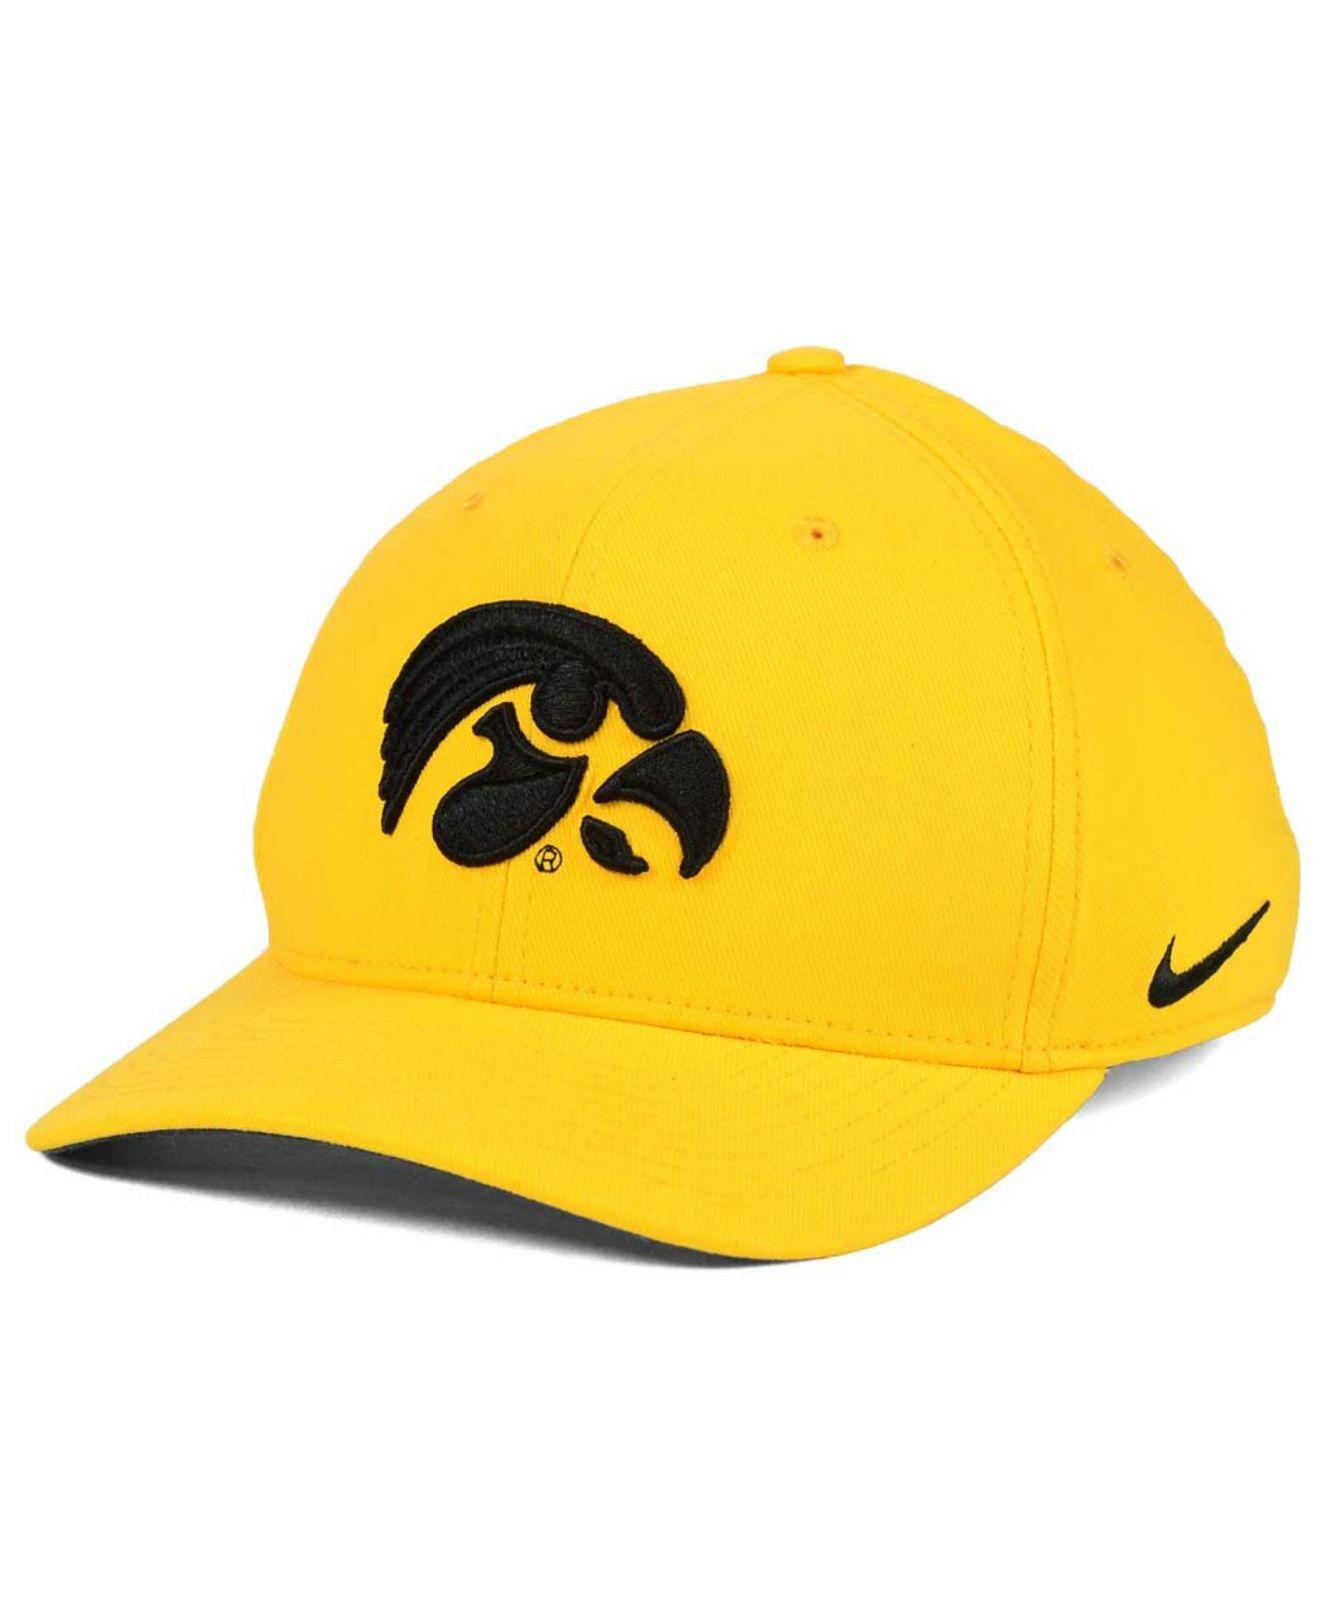 finest selection 18a50 eddd6 Lyst - Nike Iowa Hawkeyes Classic Swoosh Cap in Yellow for Men